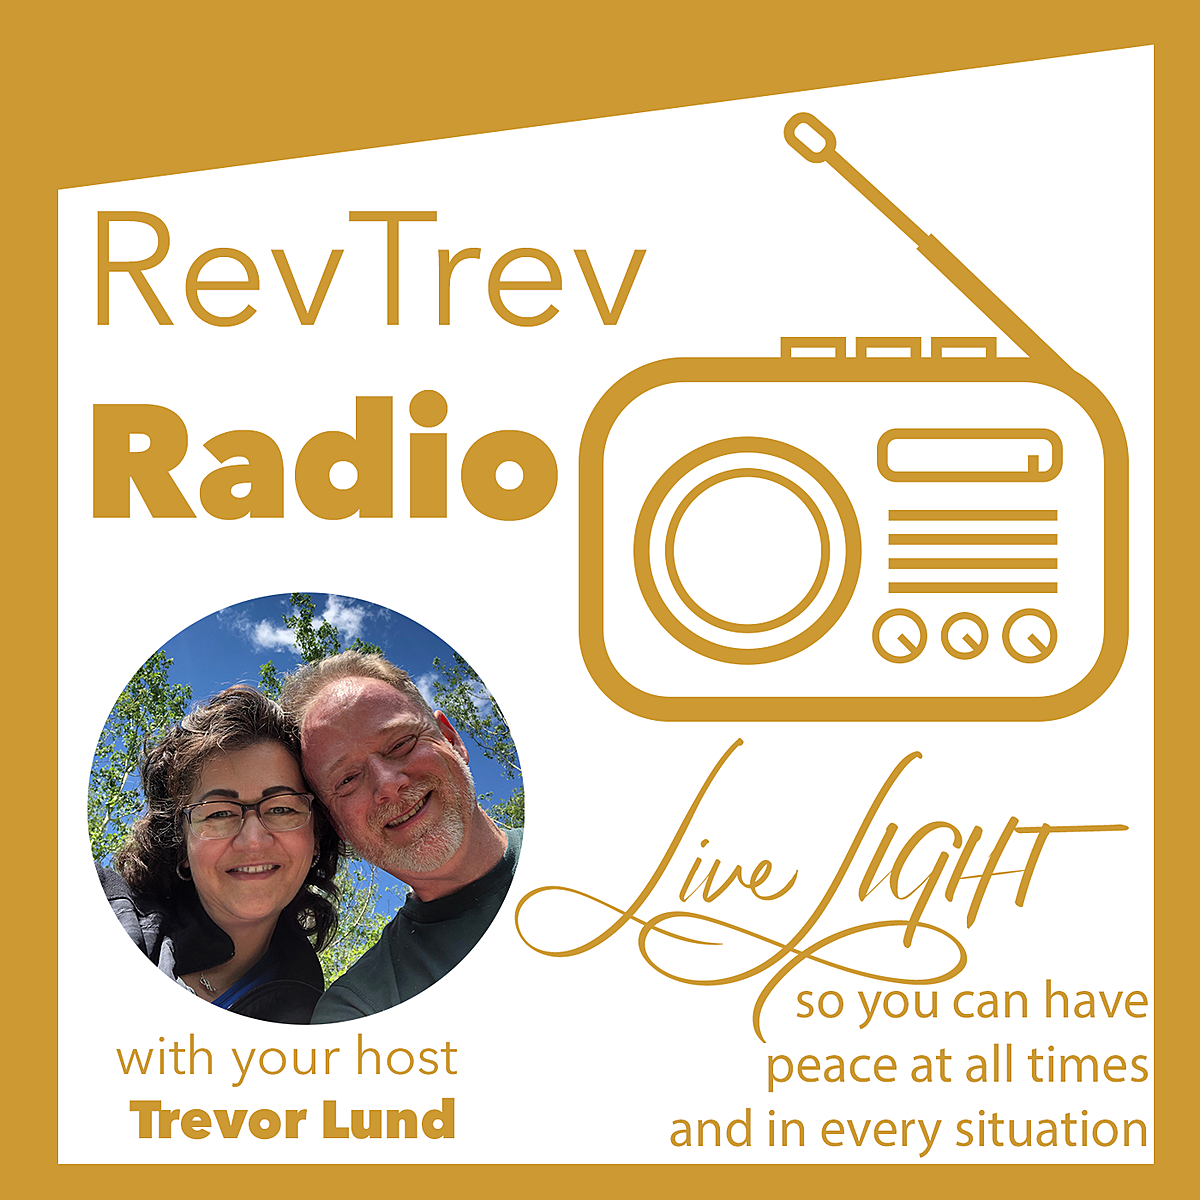 RevTrev Radio